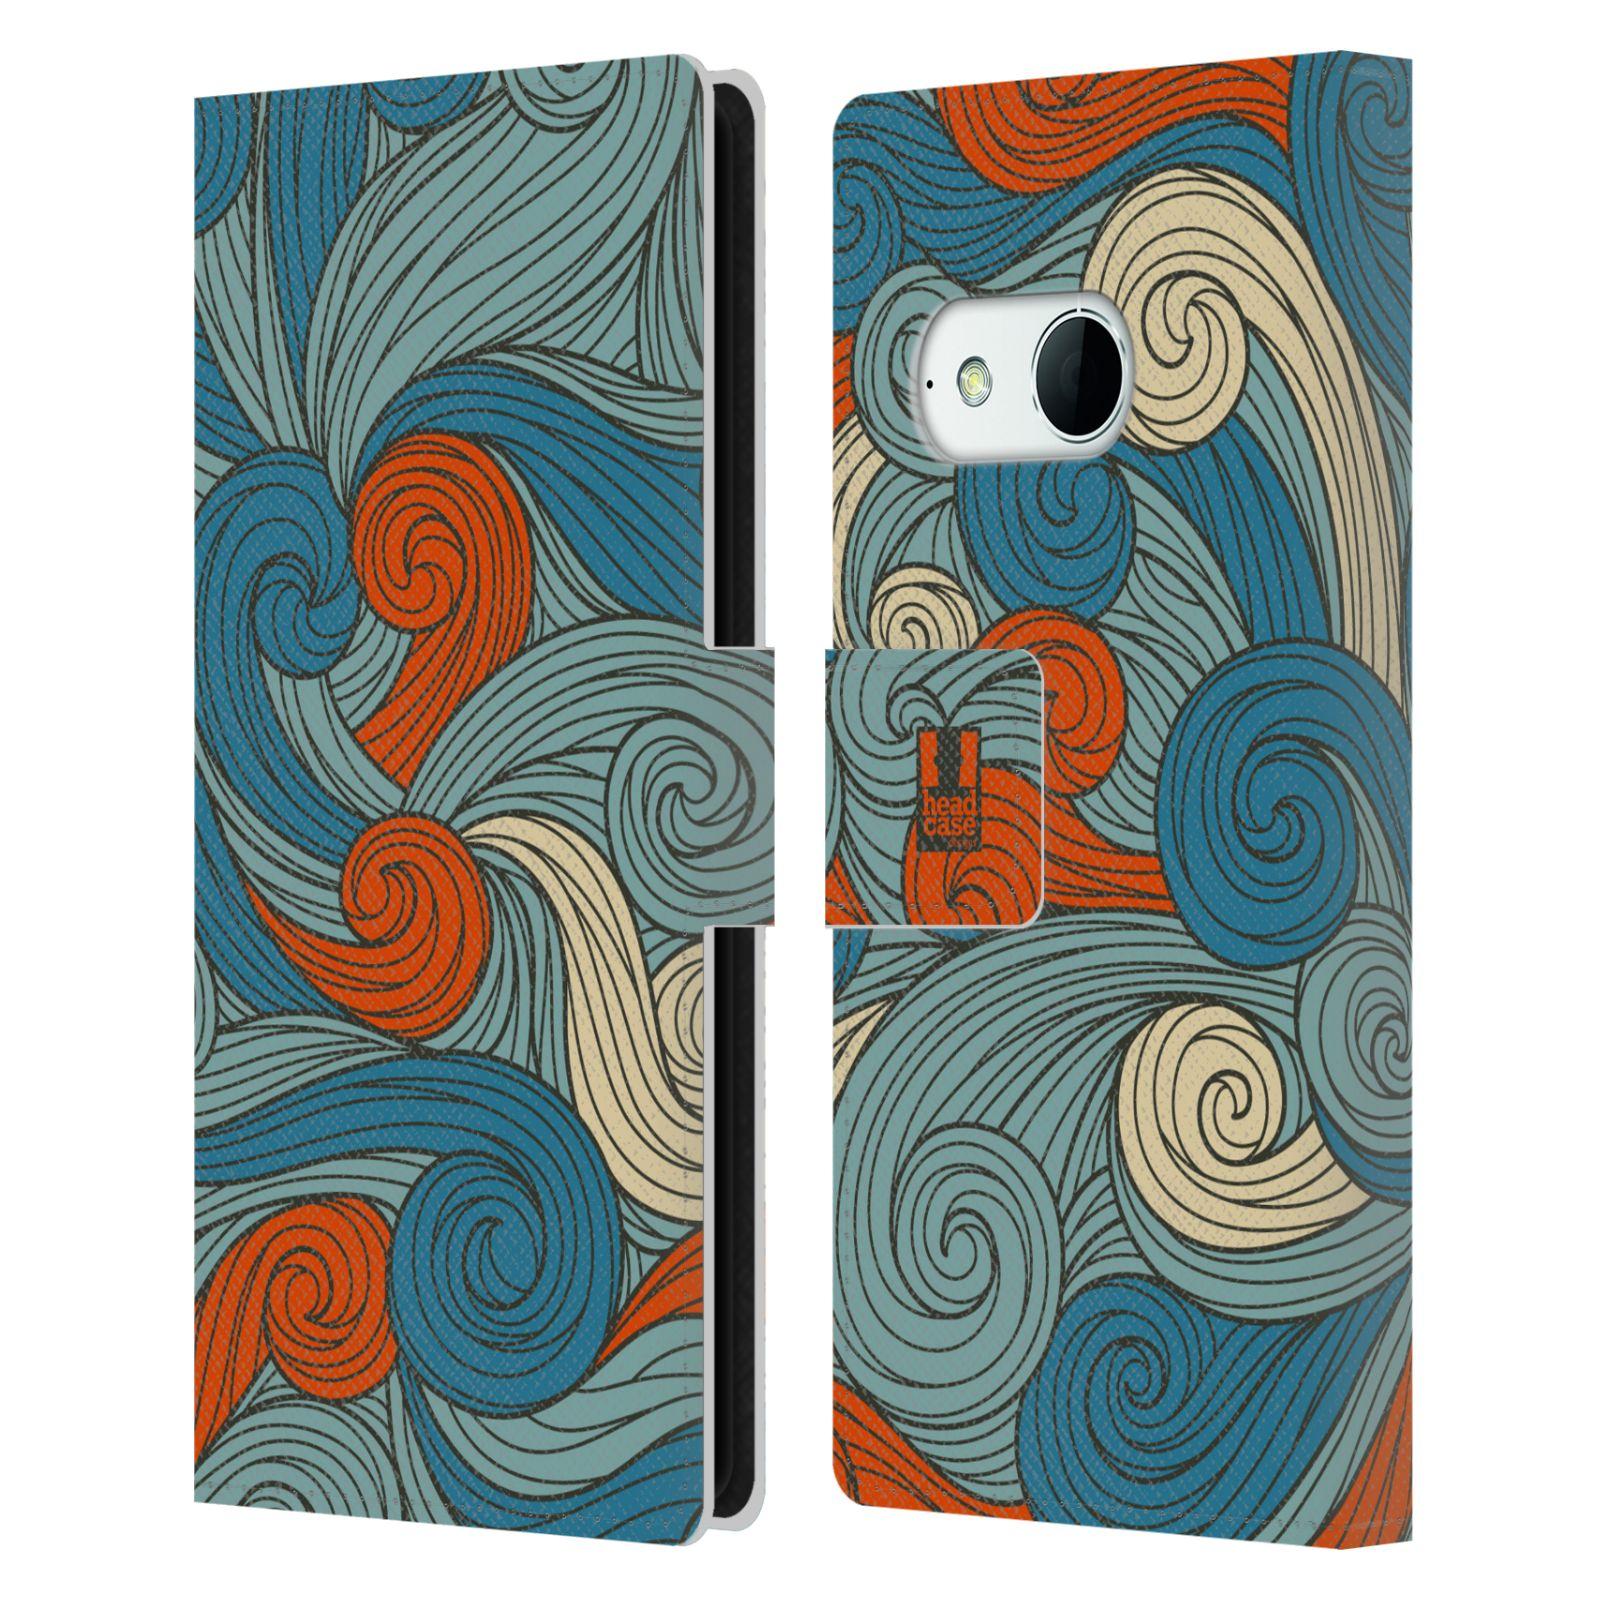 HEAD CASE Flipové pouzdro pro mobil HTC ONE MINI 2 (M8) barevné vlny oranžová a modrá